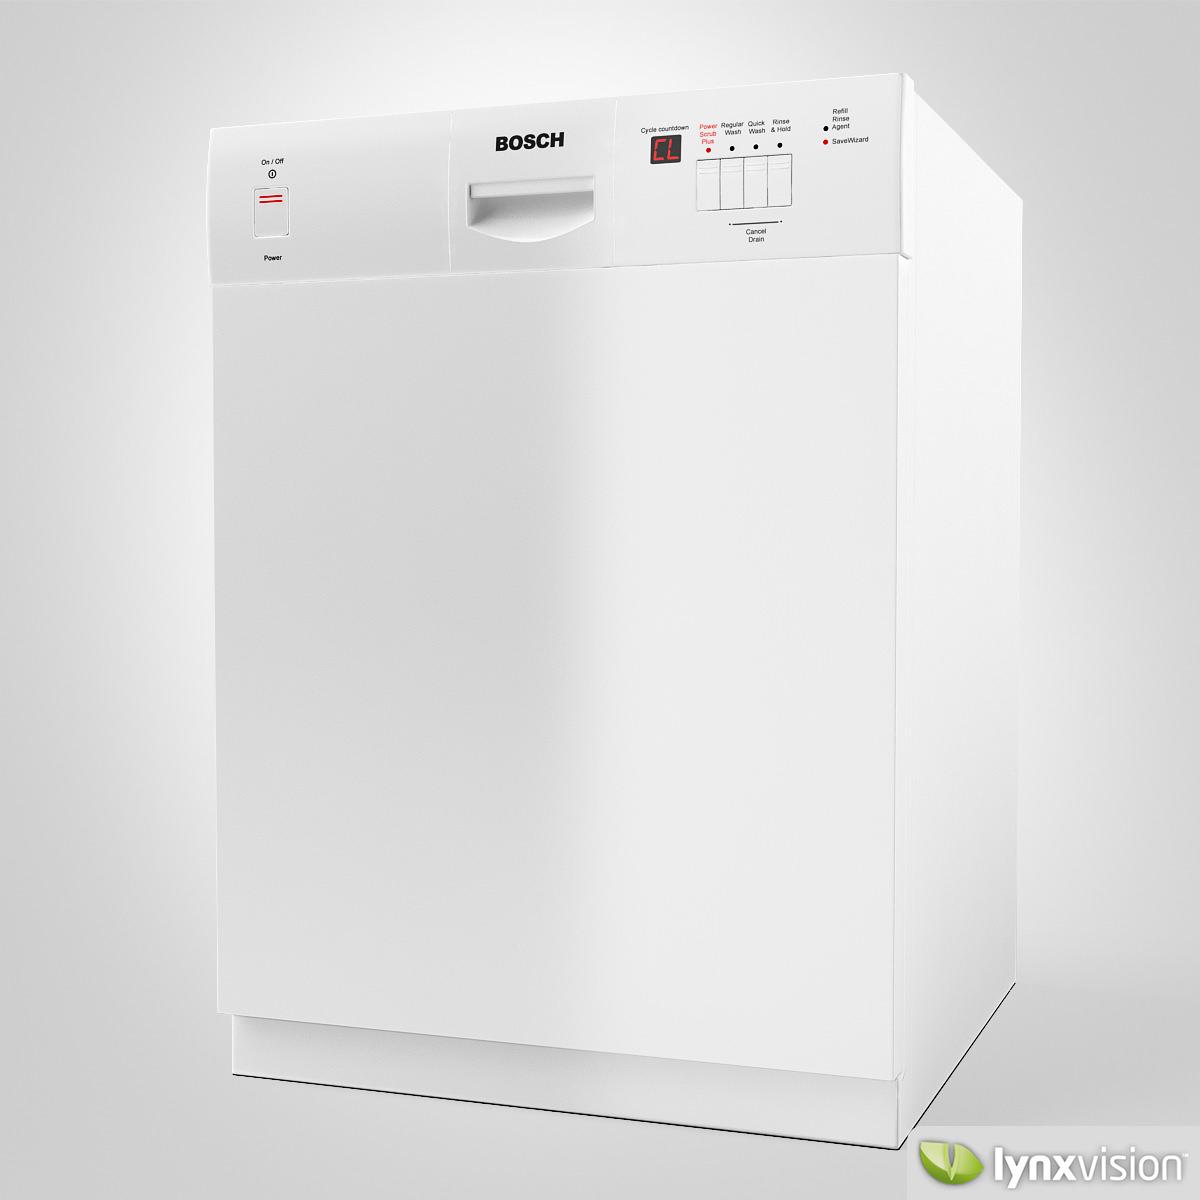 3d bosch dishwasher